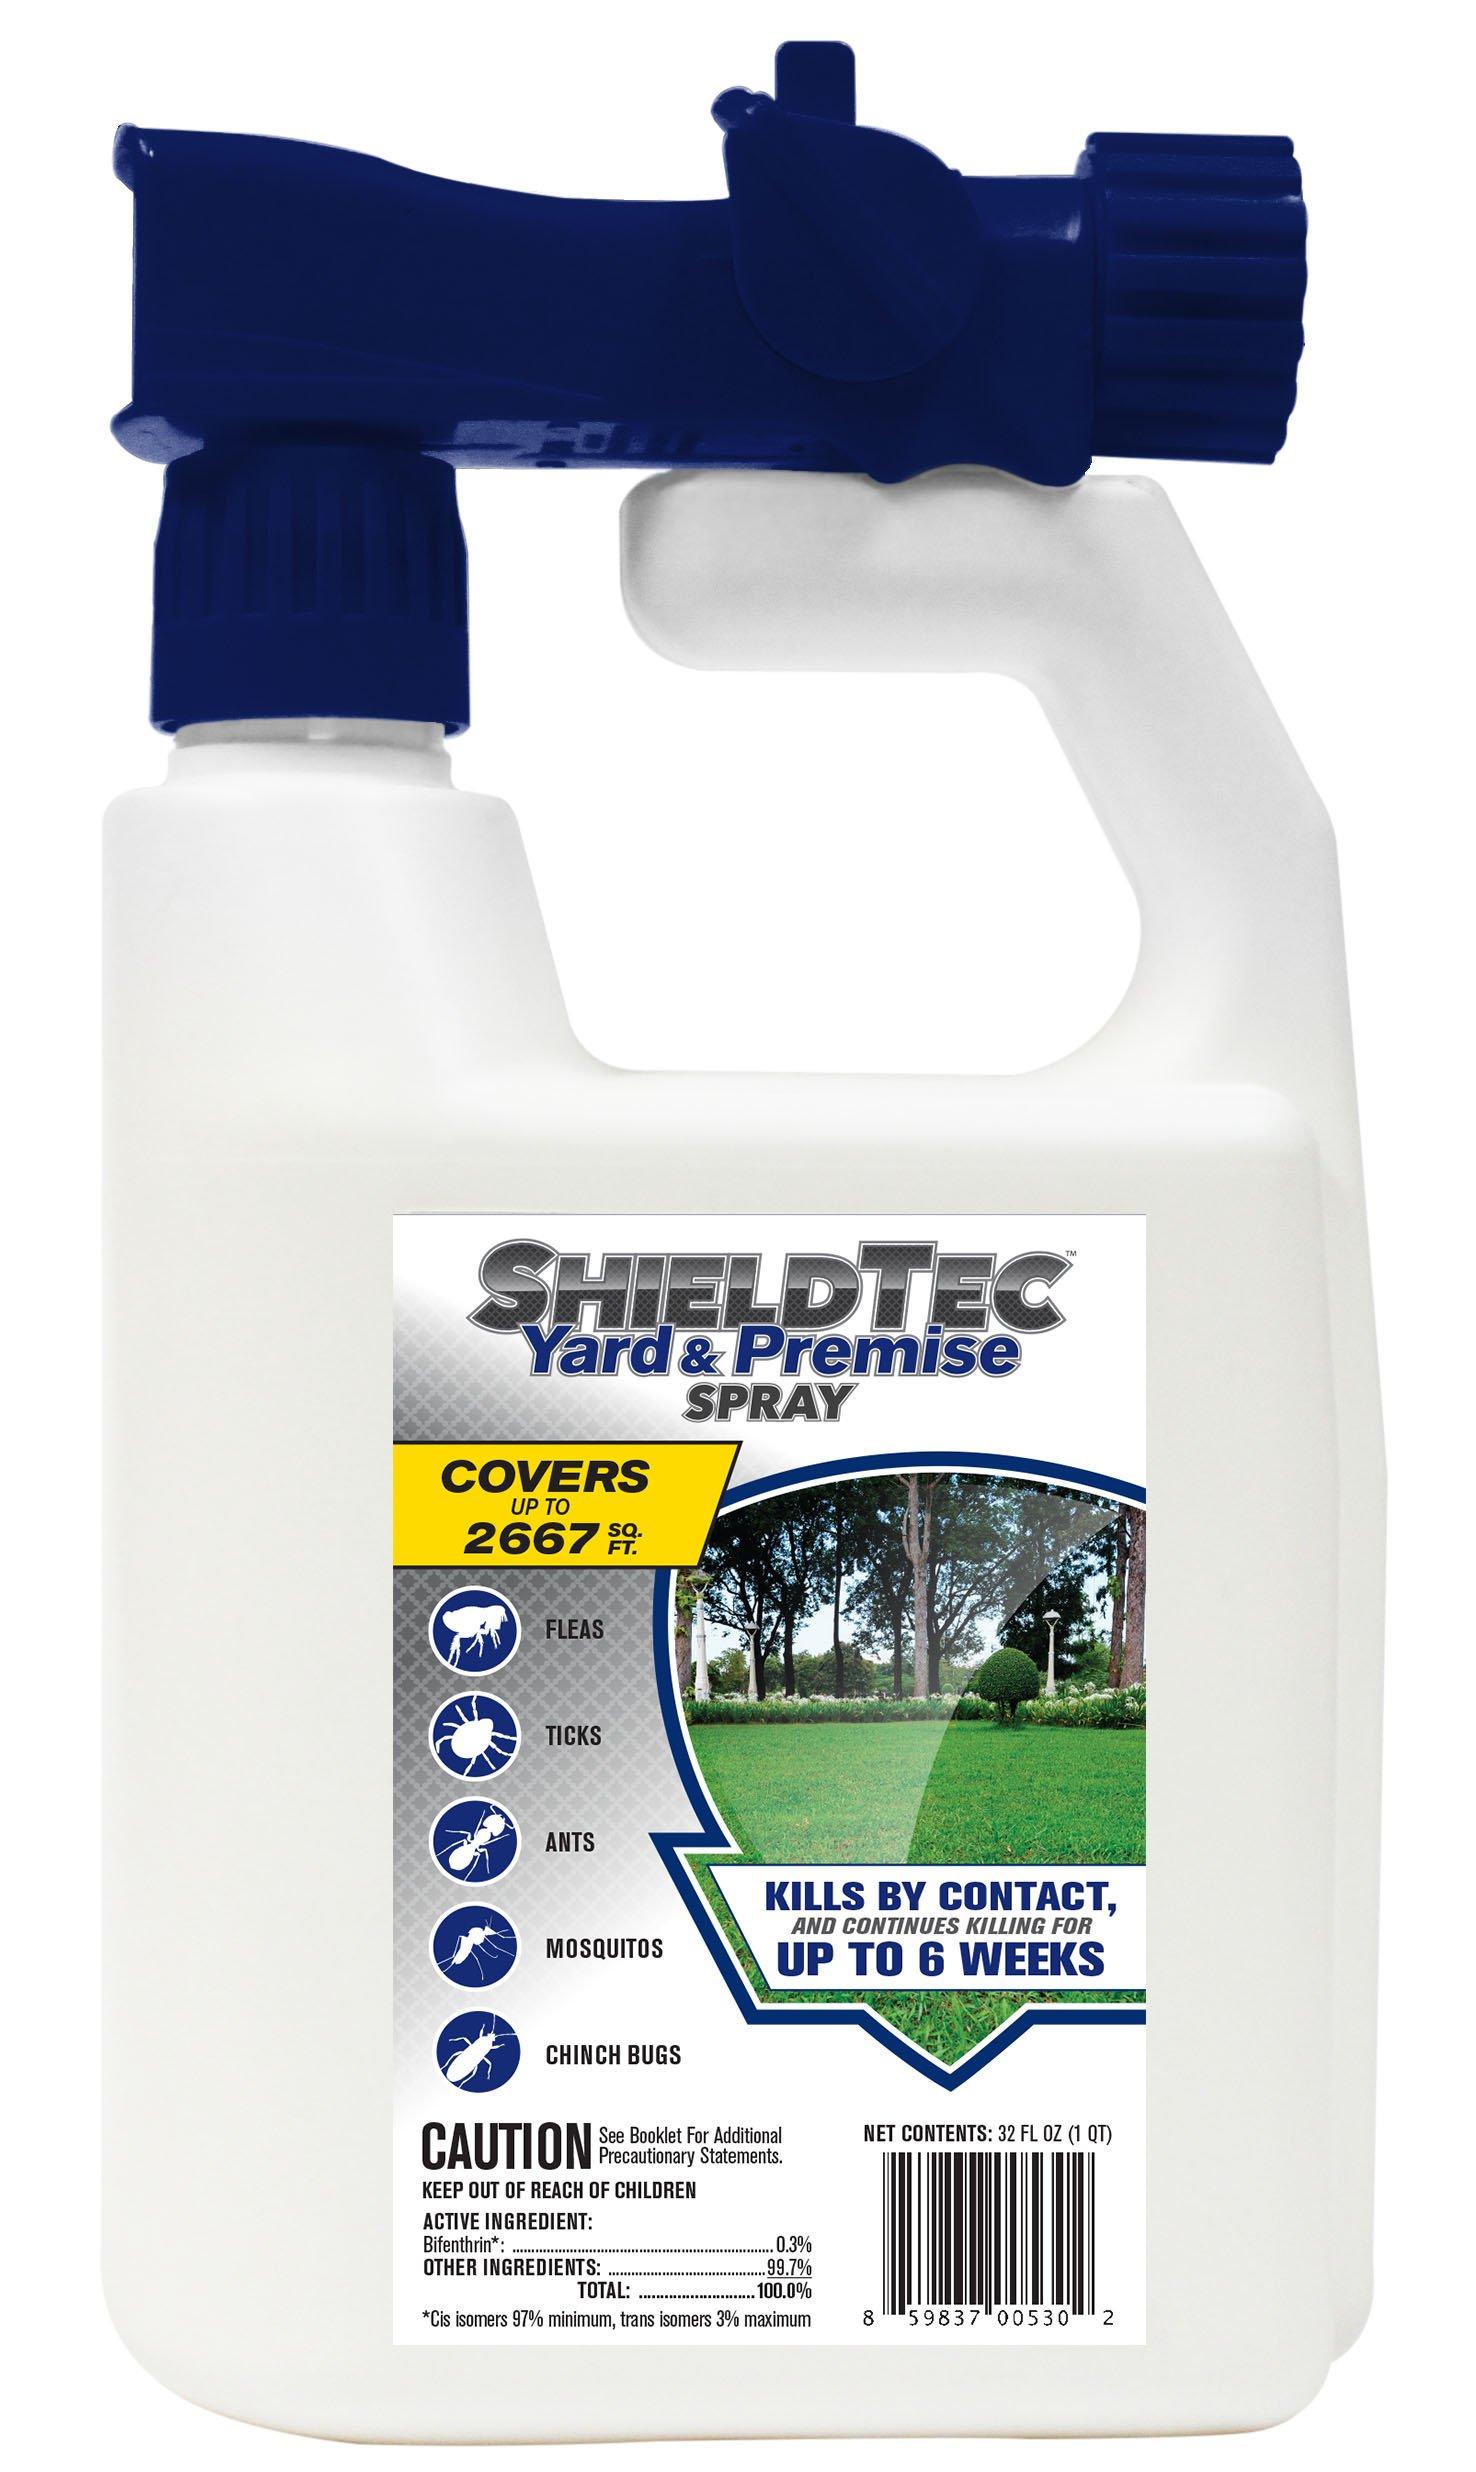 Promika Shieldtec Yard & Premise Spray, 32 oz